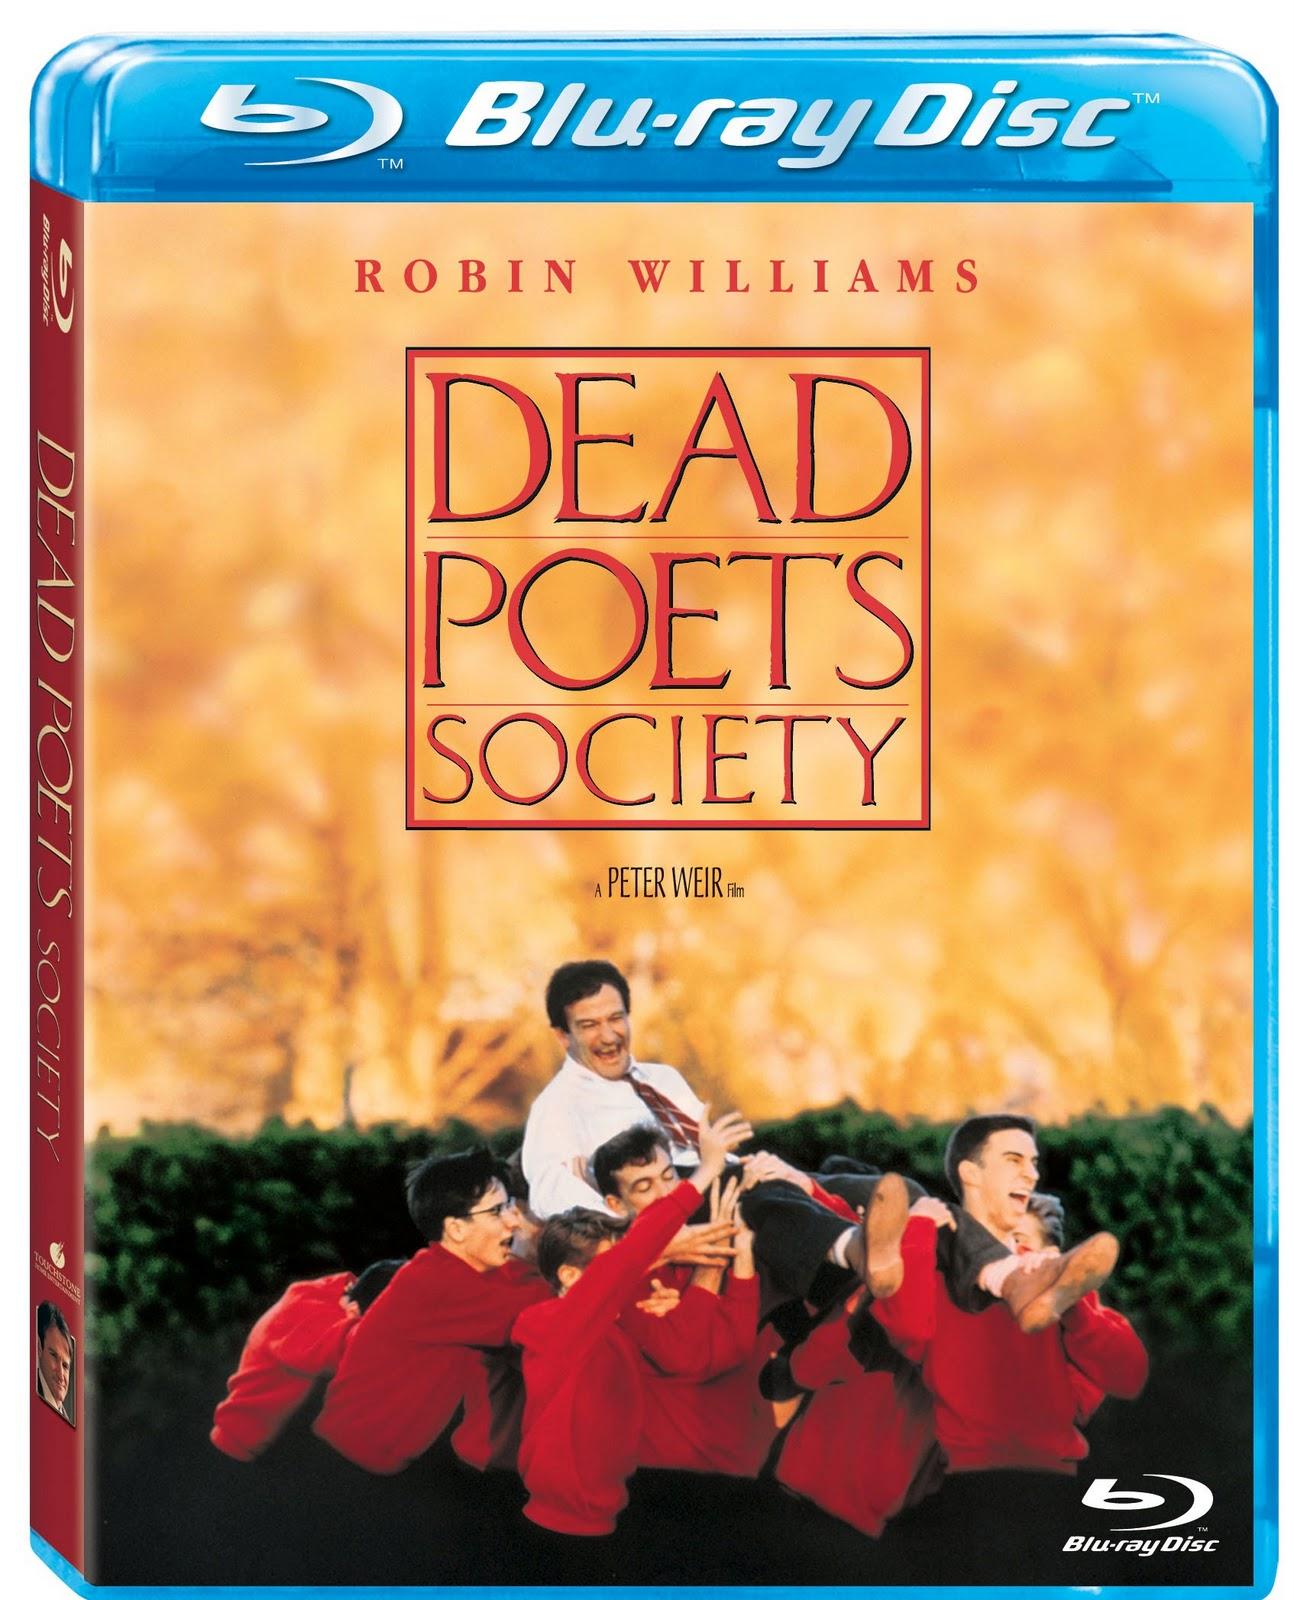 carpe diem dead poets society essays homework academic writing carpe diem dead poets society essays